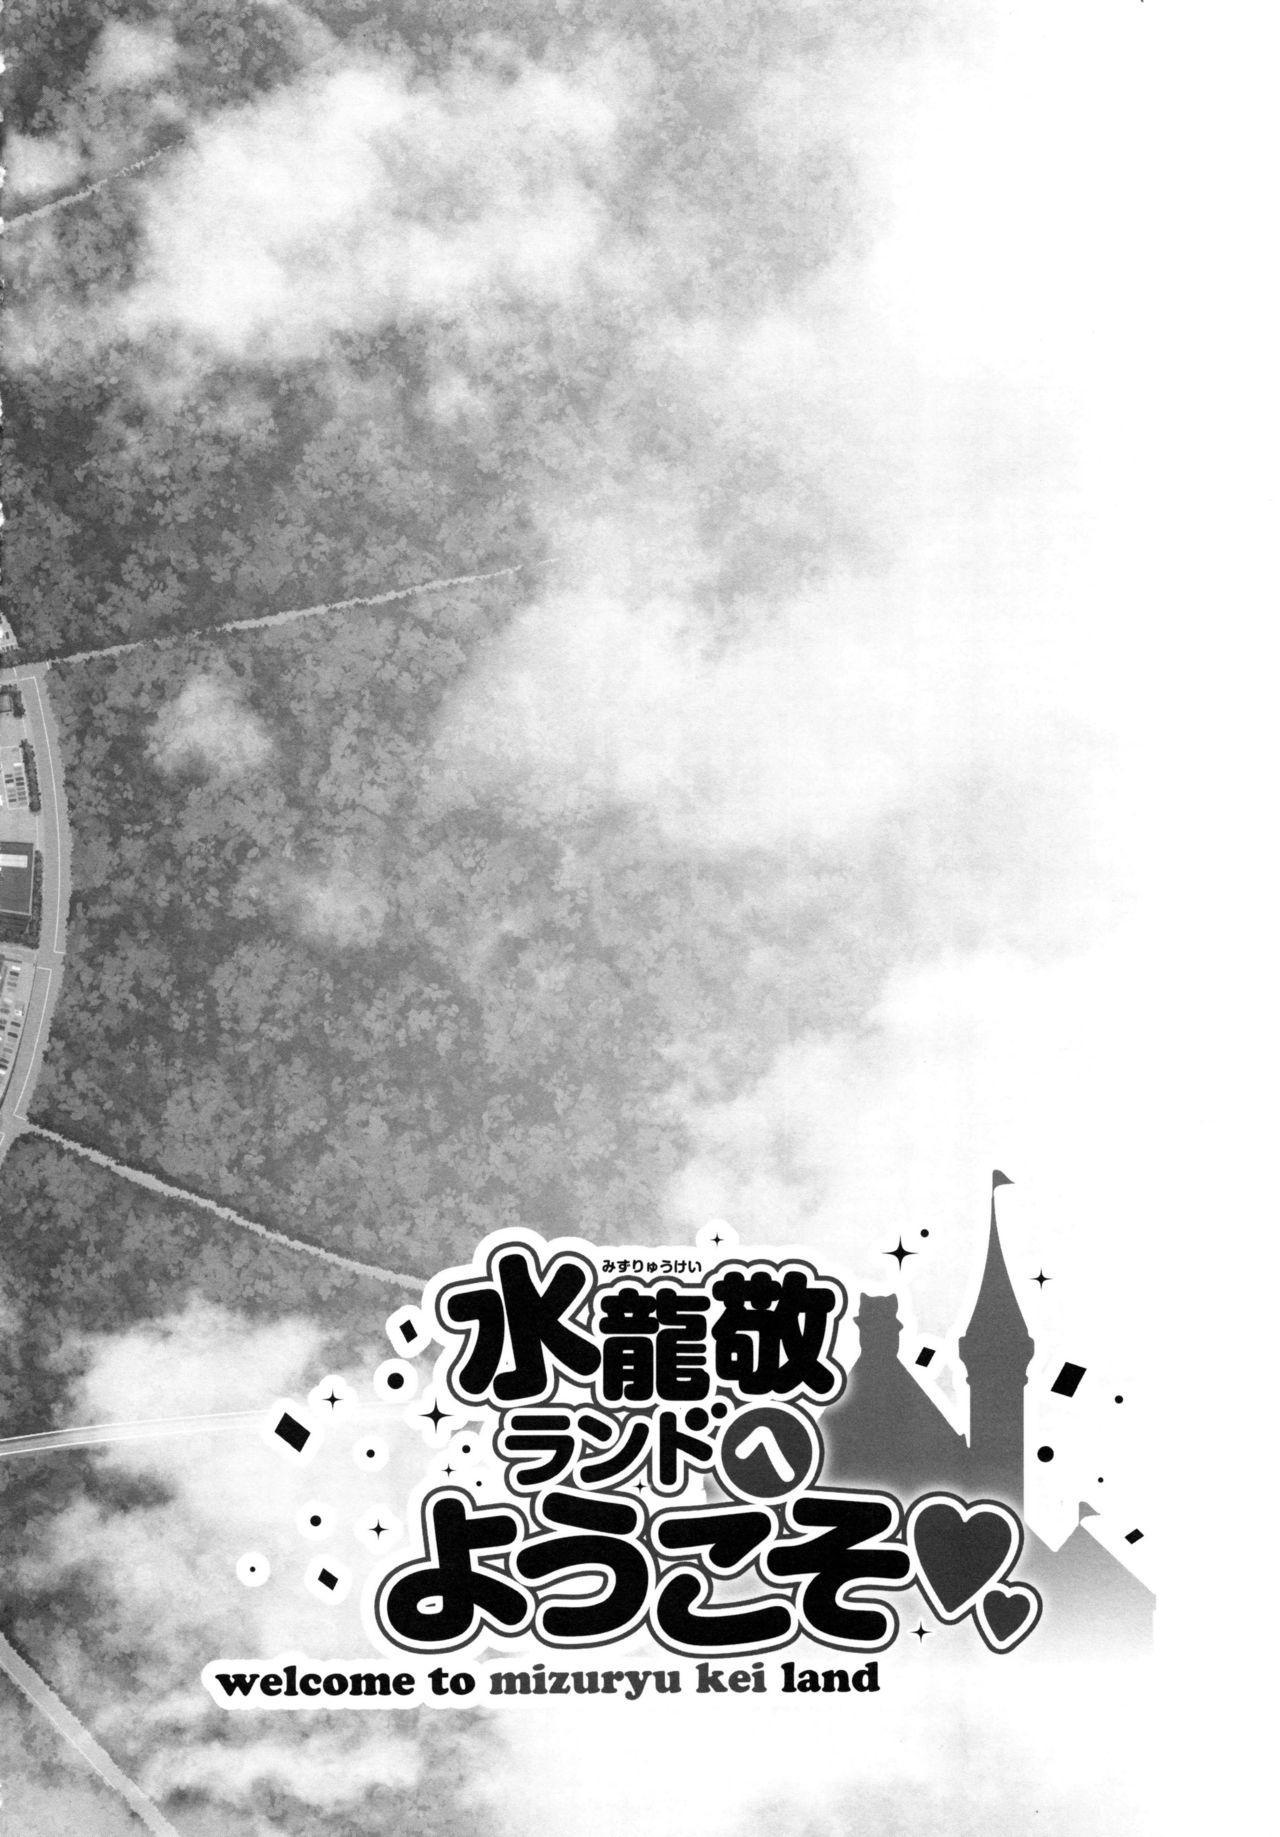 Oideyo! Mizuryu Kei Land the 6th Day 2